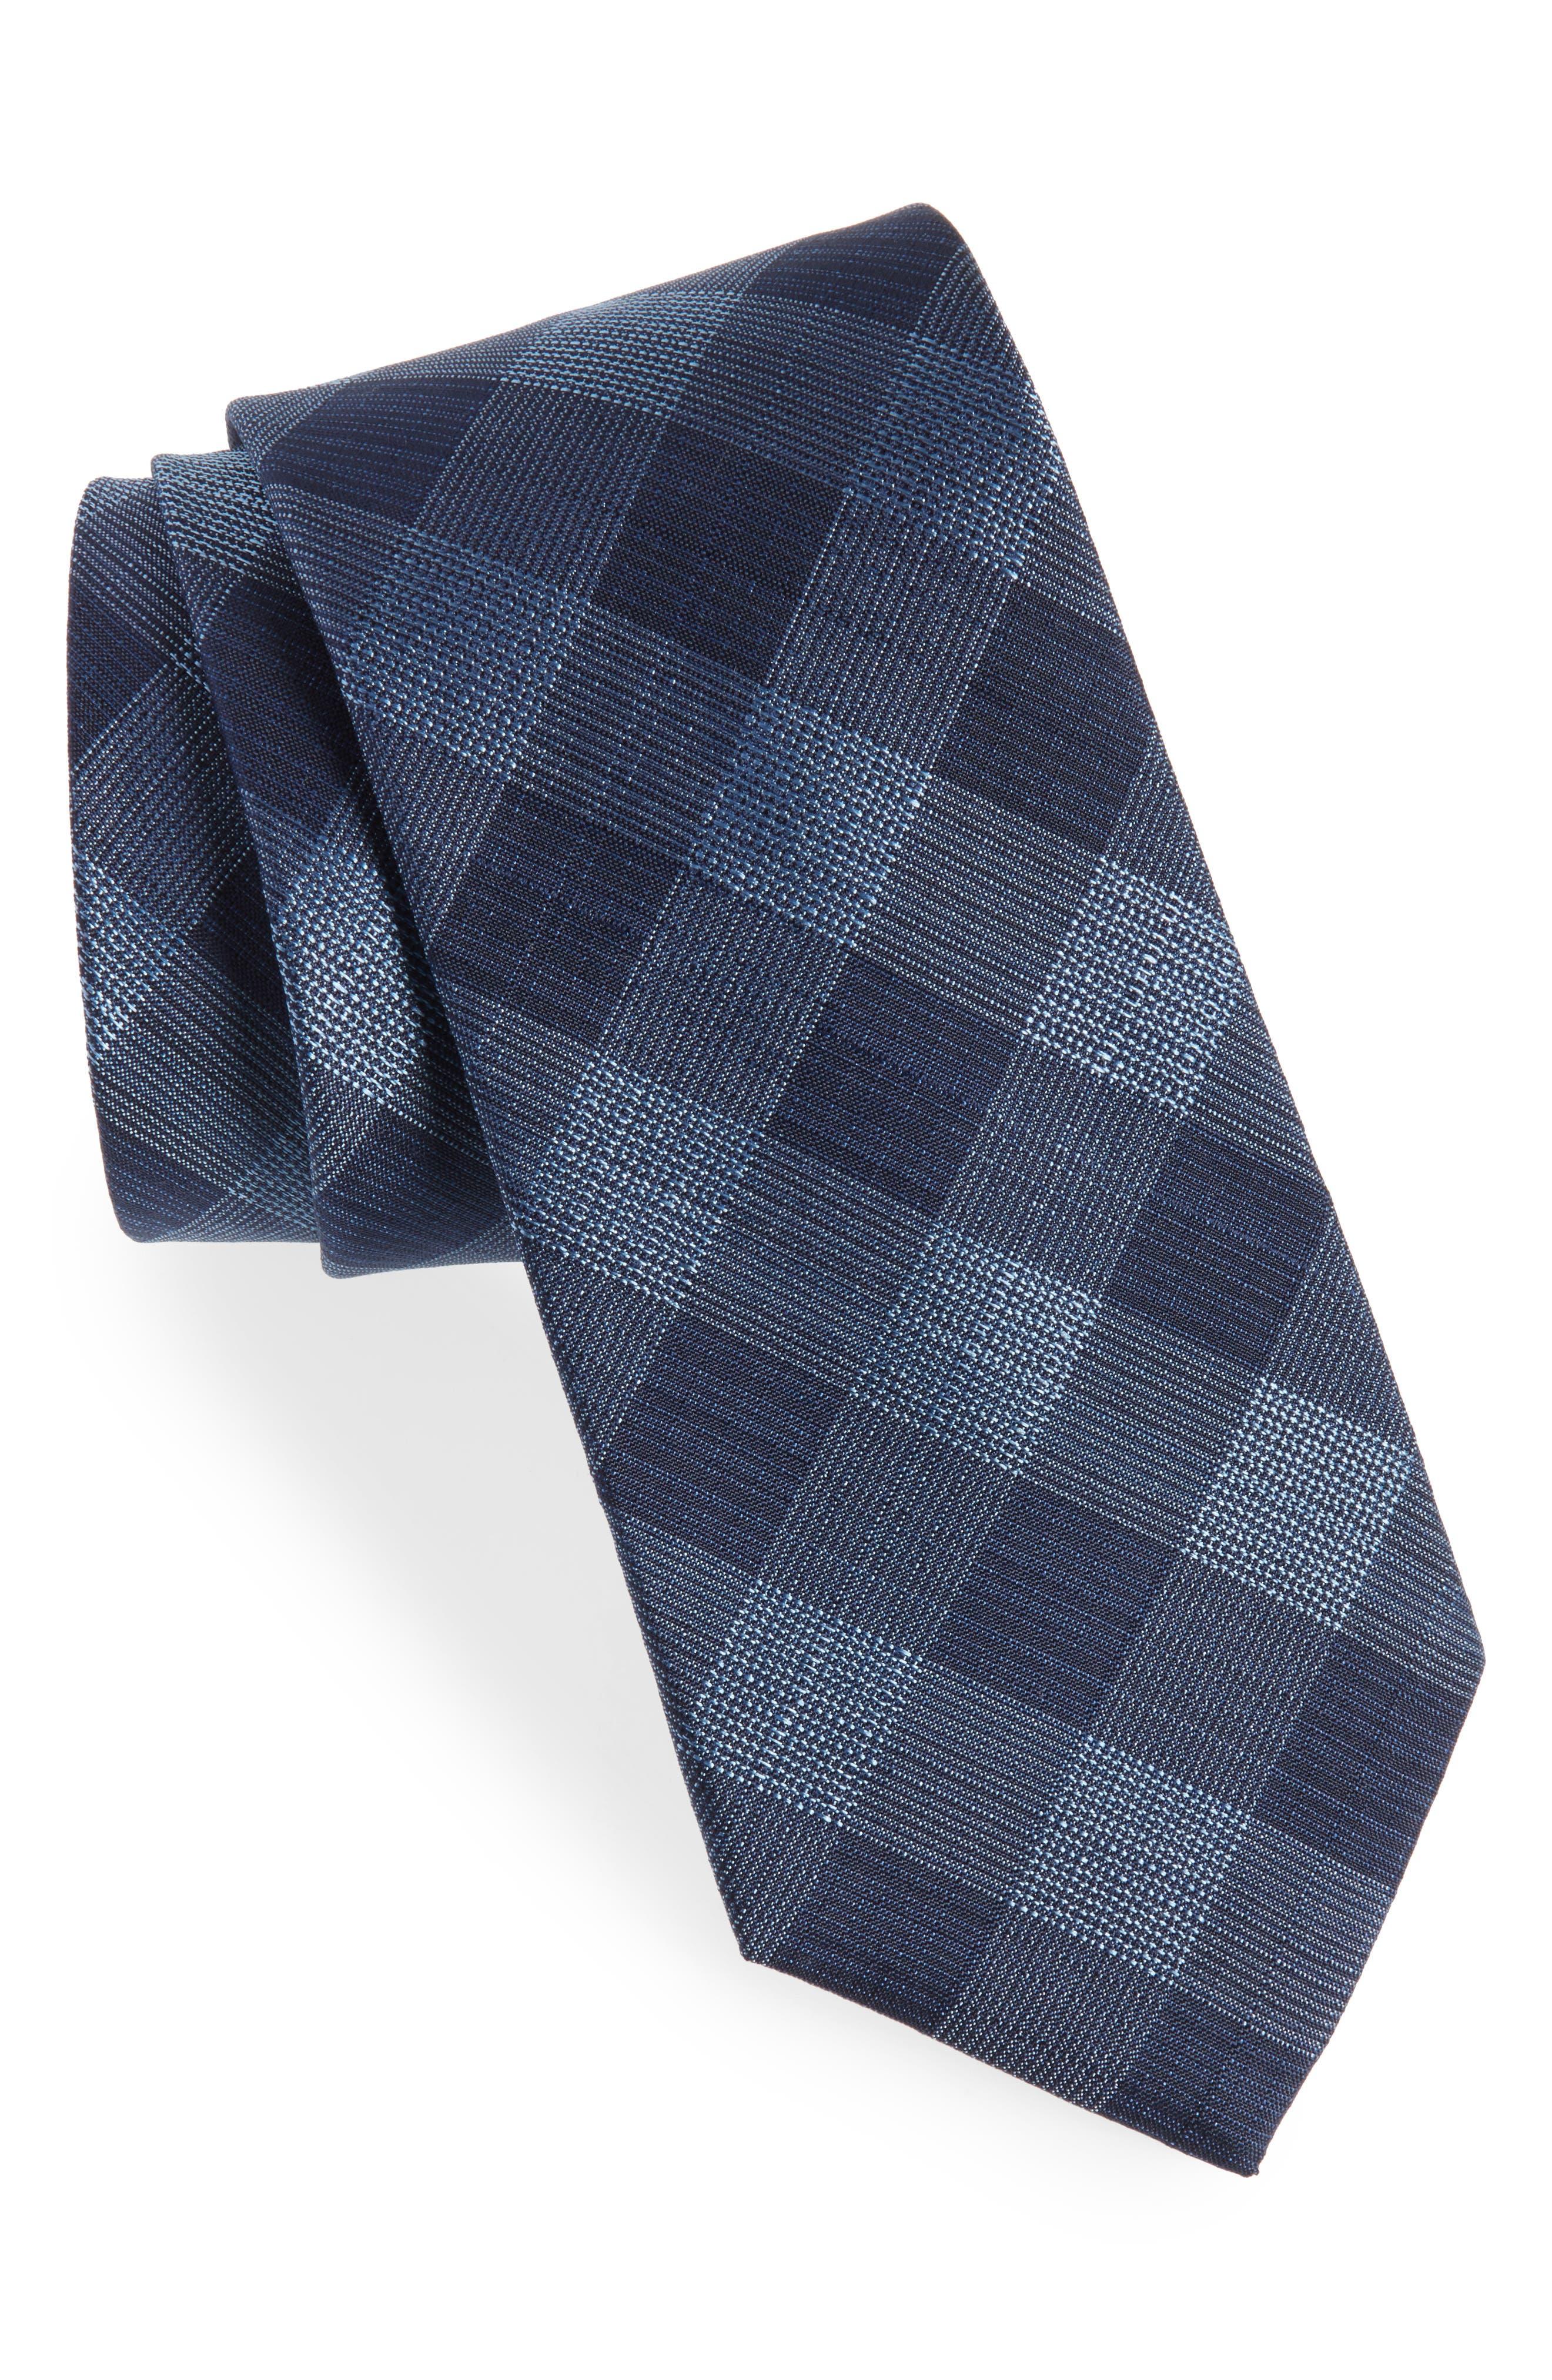 Raymer Check Silk Tie,                             Main thumbnail 1, color,                             Navy